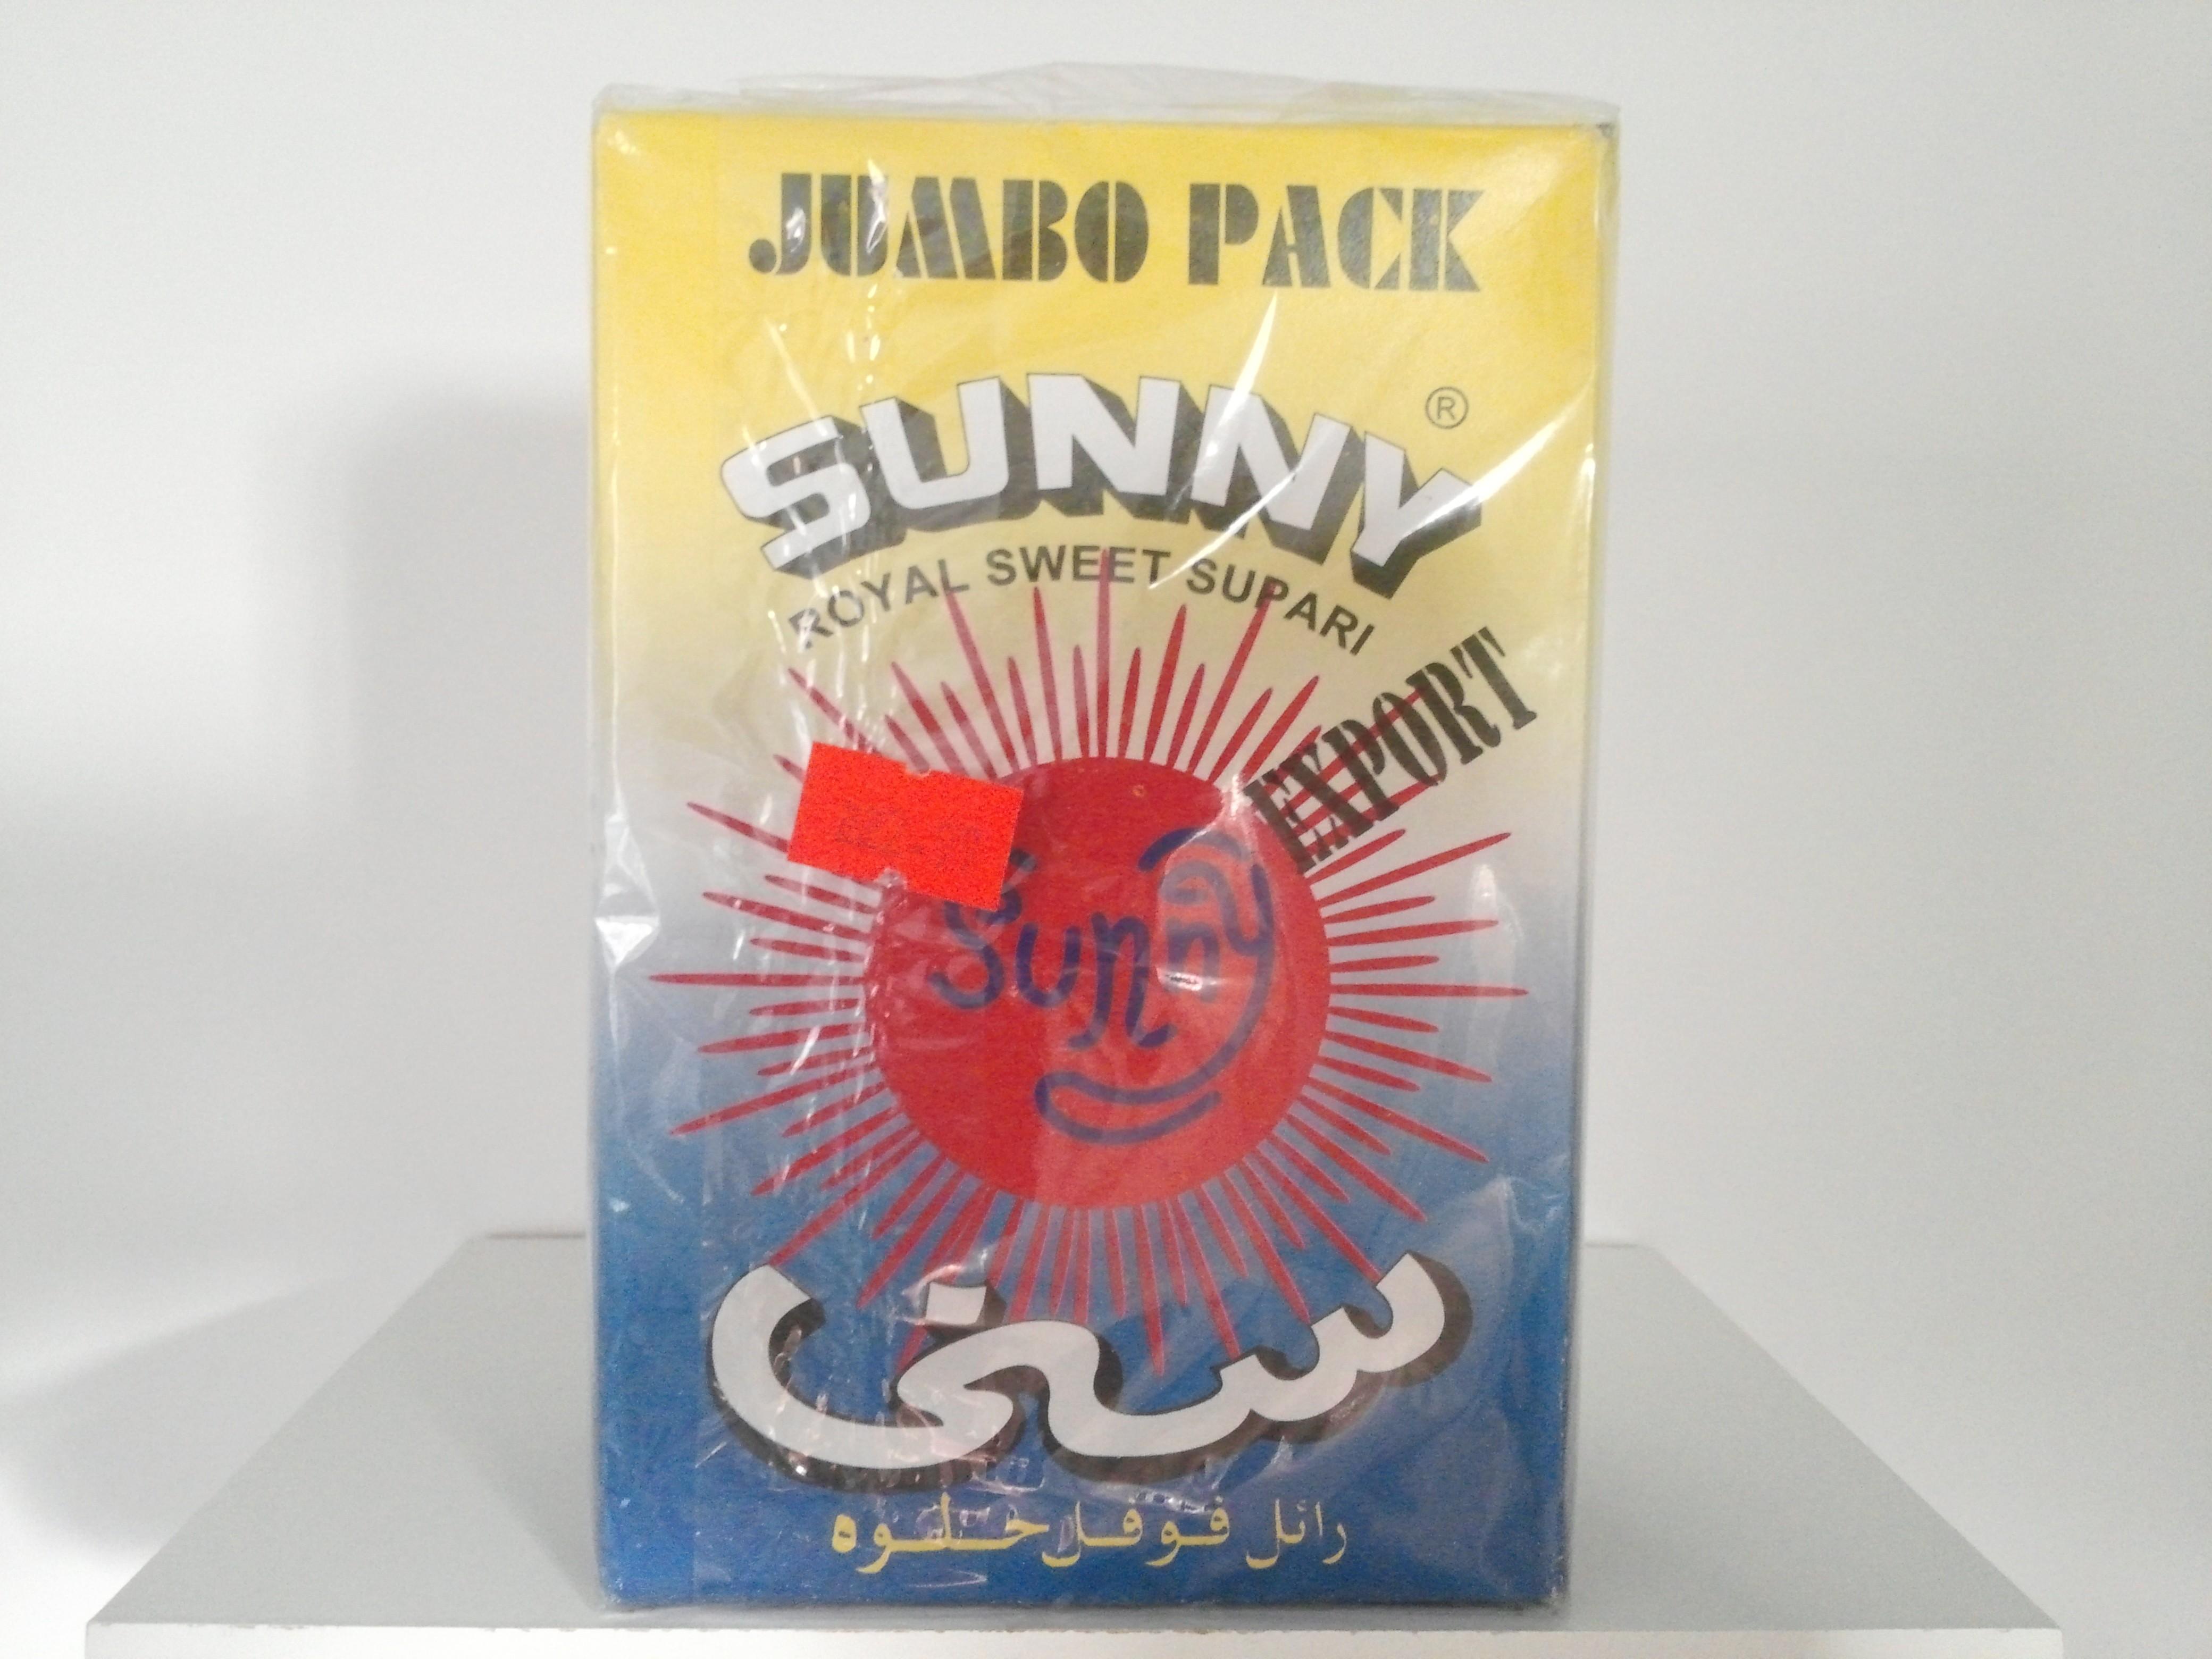 Sunny Royal Sweet Supari Jumbo Pack